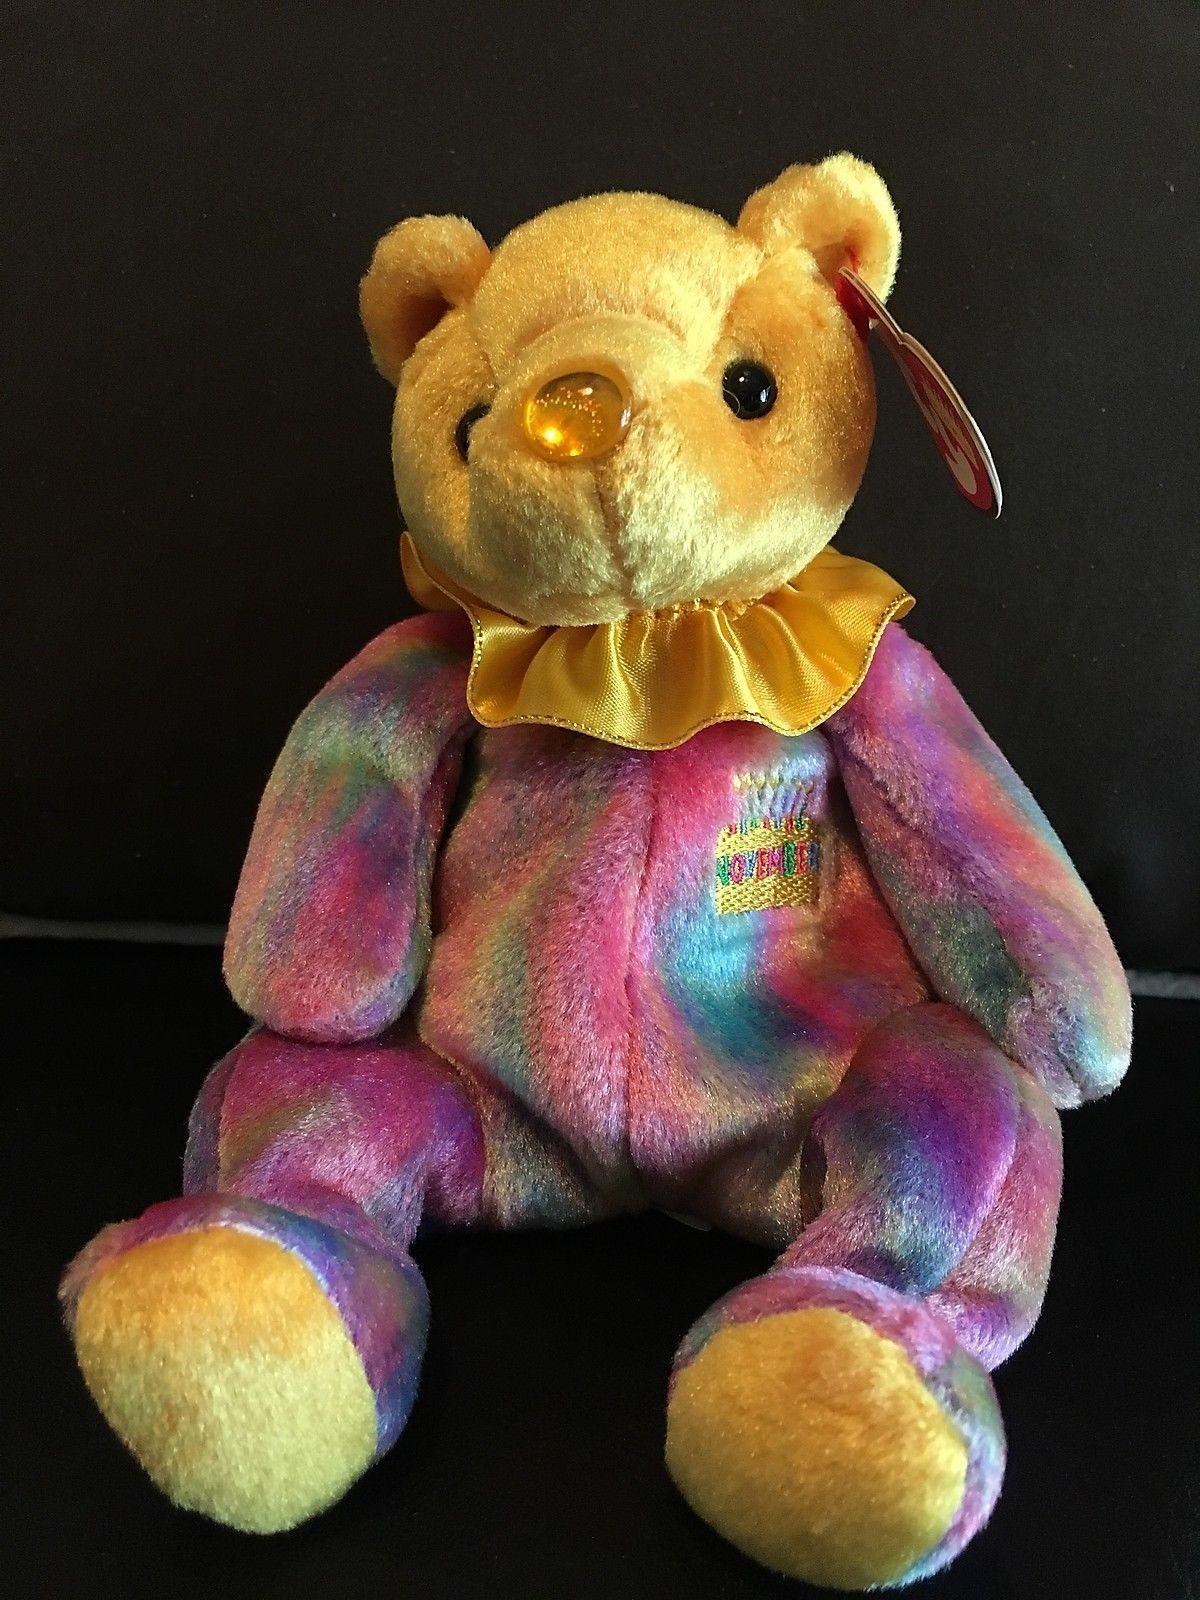 34a366adb0f TY BEANIE BABY NOVEMBER BIRTHDAY BEAR CLOWN COLLAR MINT   MINT TAGS RETIRED  NEW